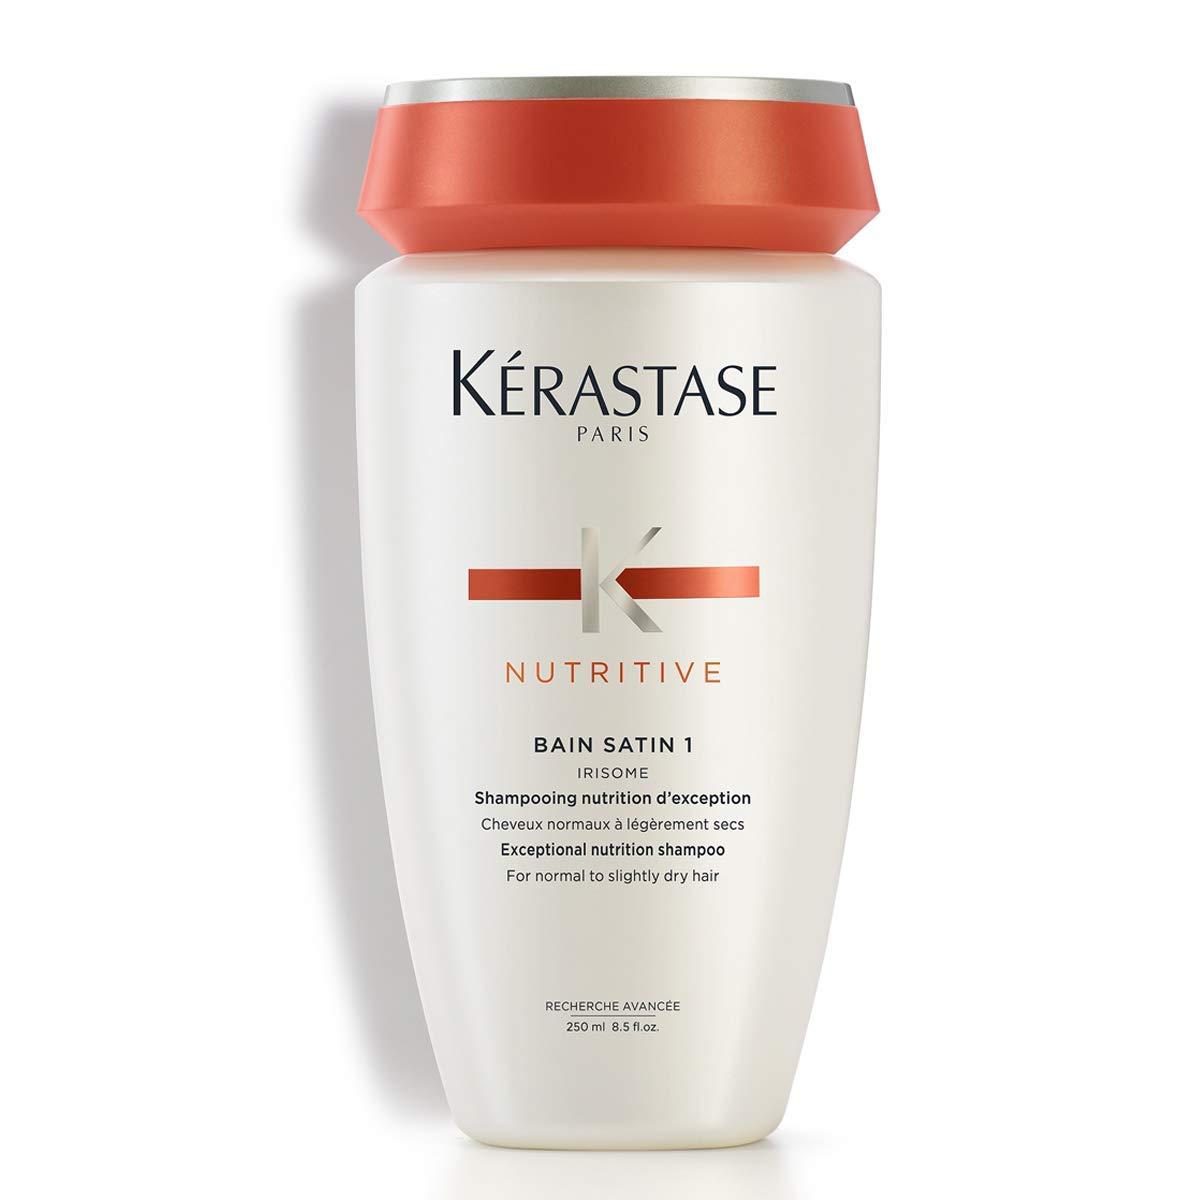 Kerastase Nutritive Bain Satin Nutrition Shampoo